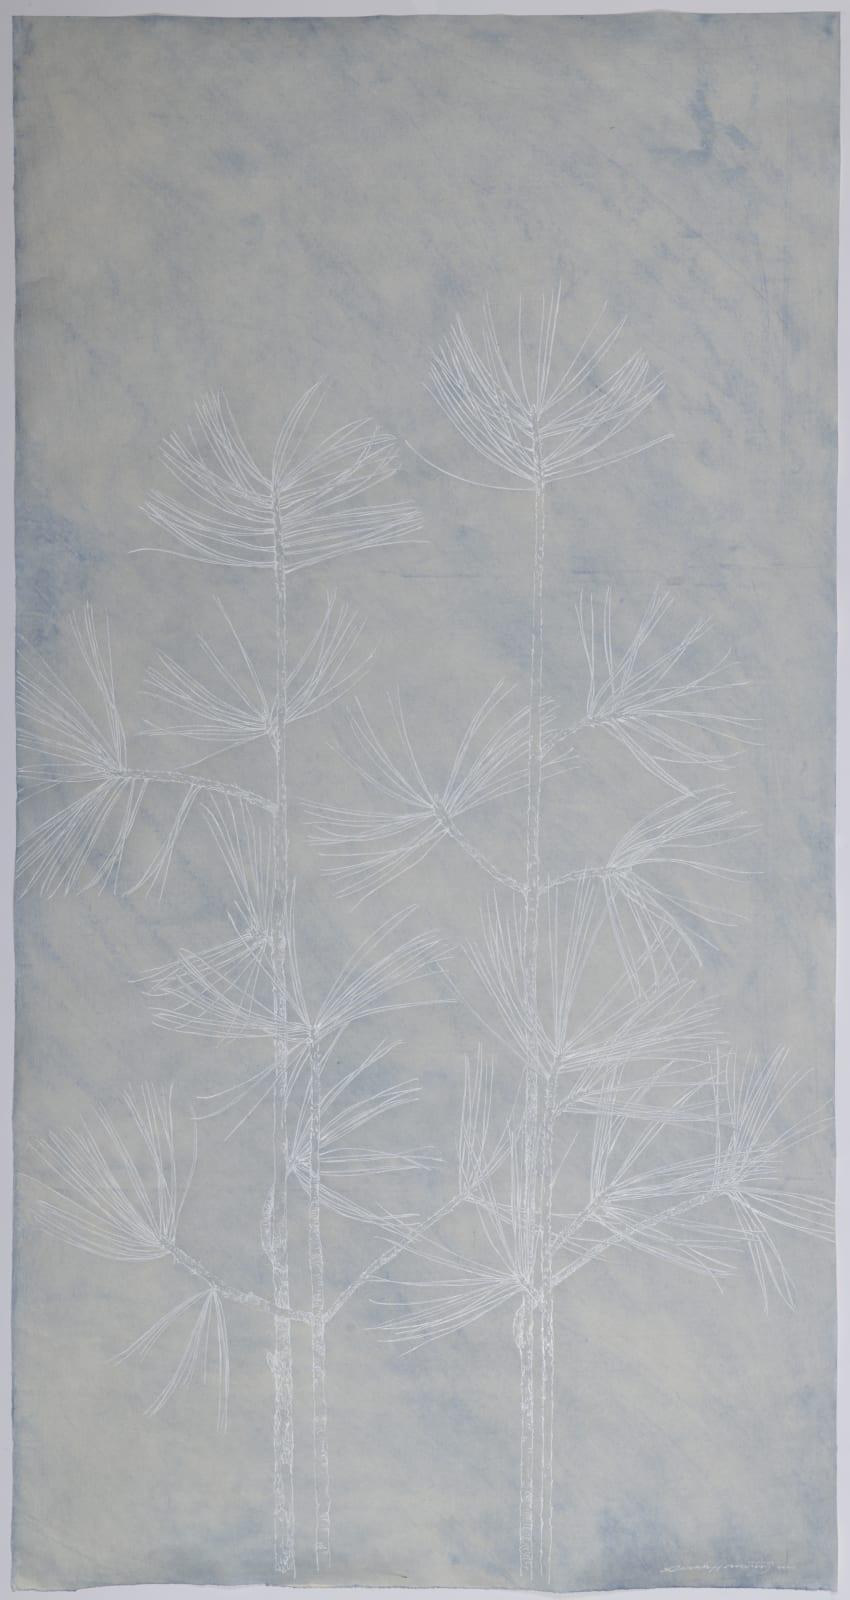 Sarah Horowitz, Early Morning Pines, 2021